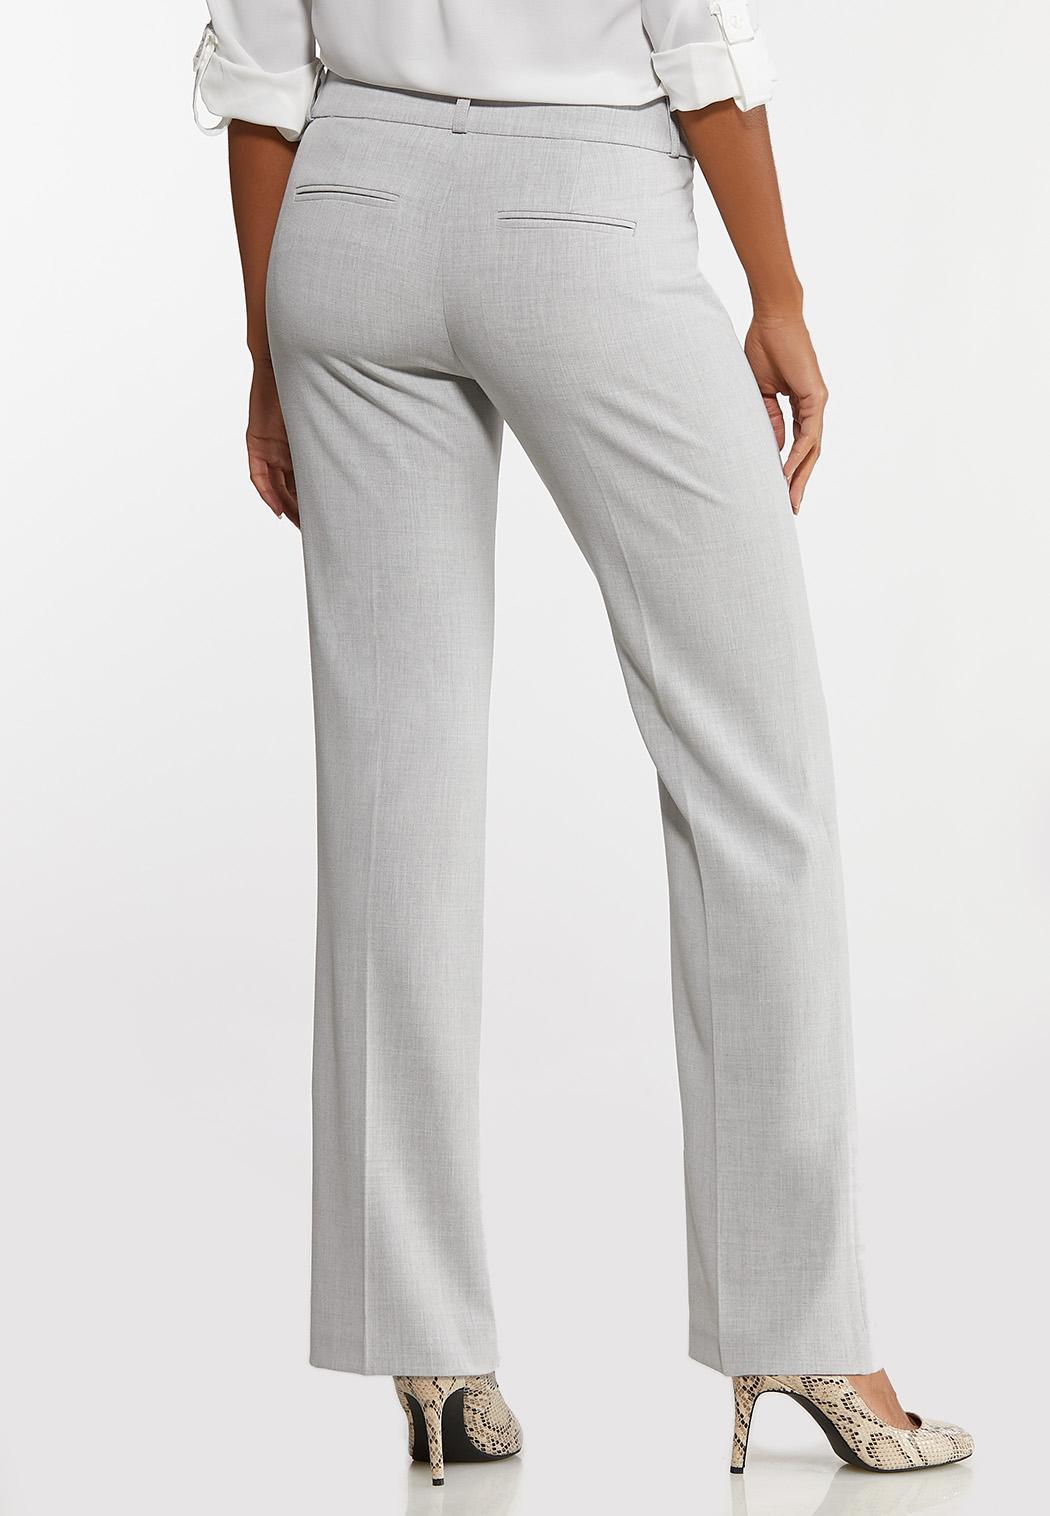 Petite Gray Trouser Pants (Item #44474569)